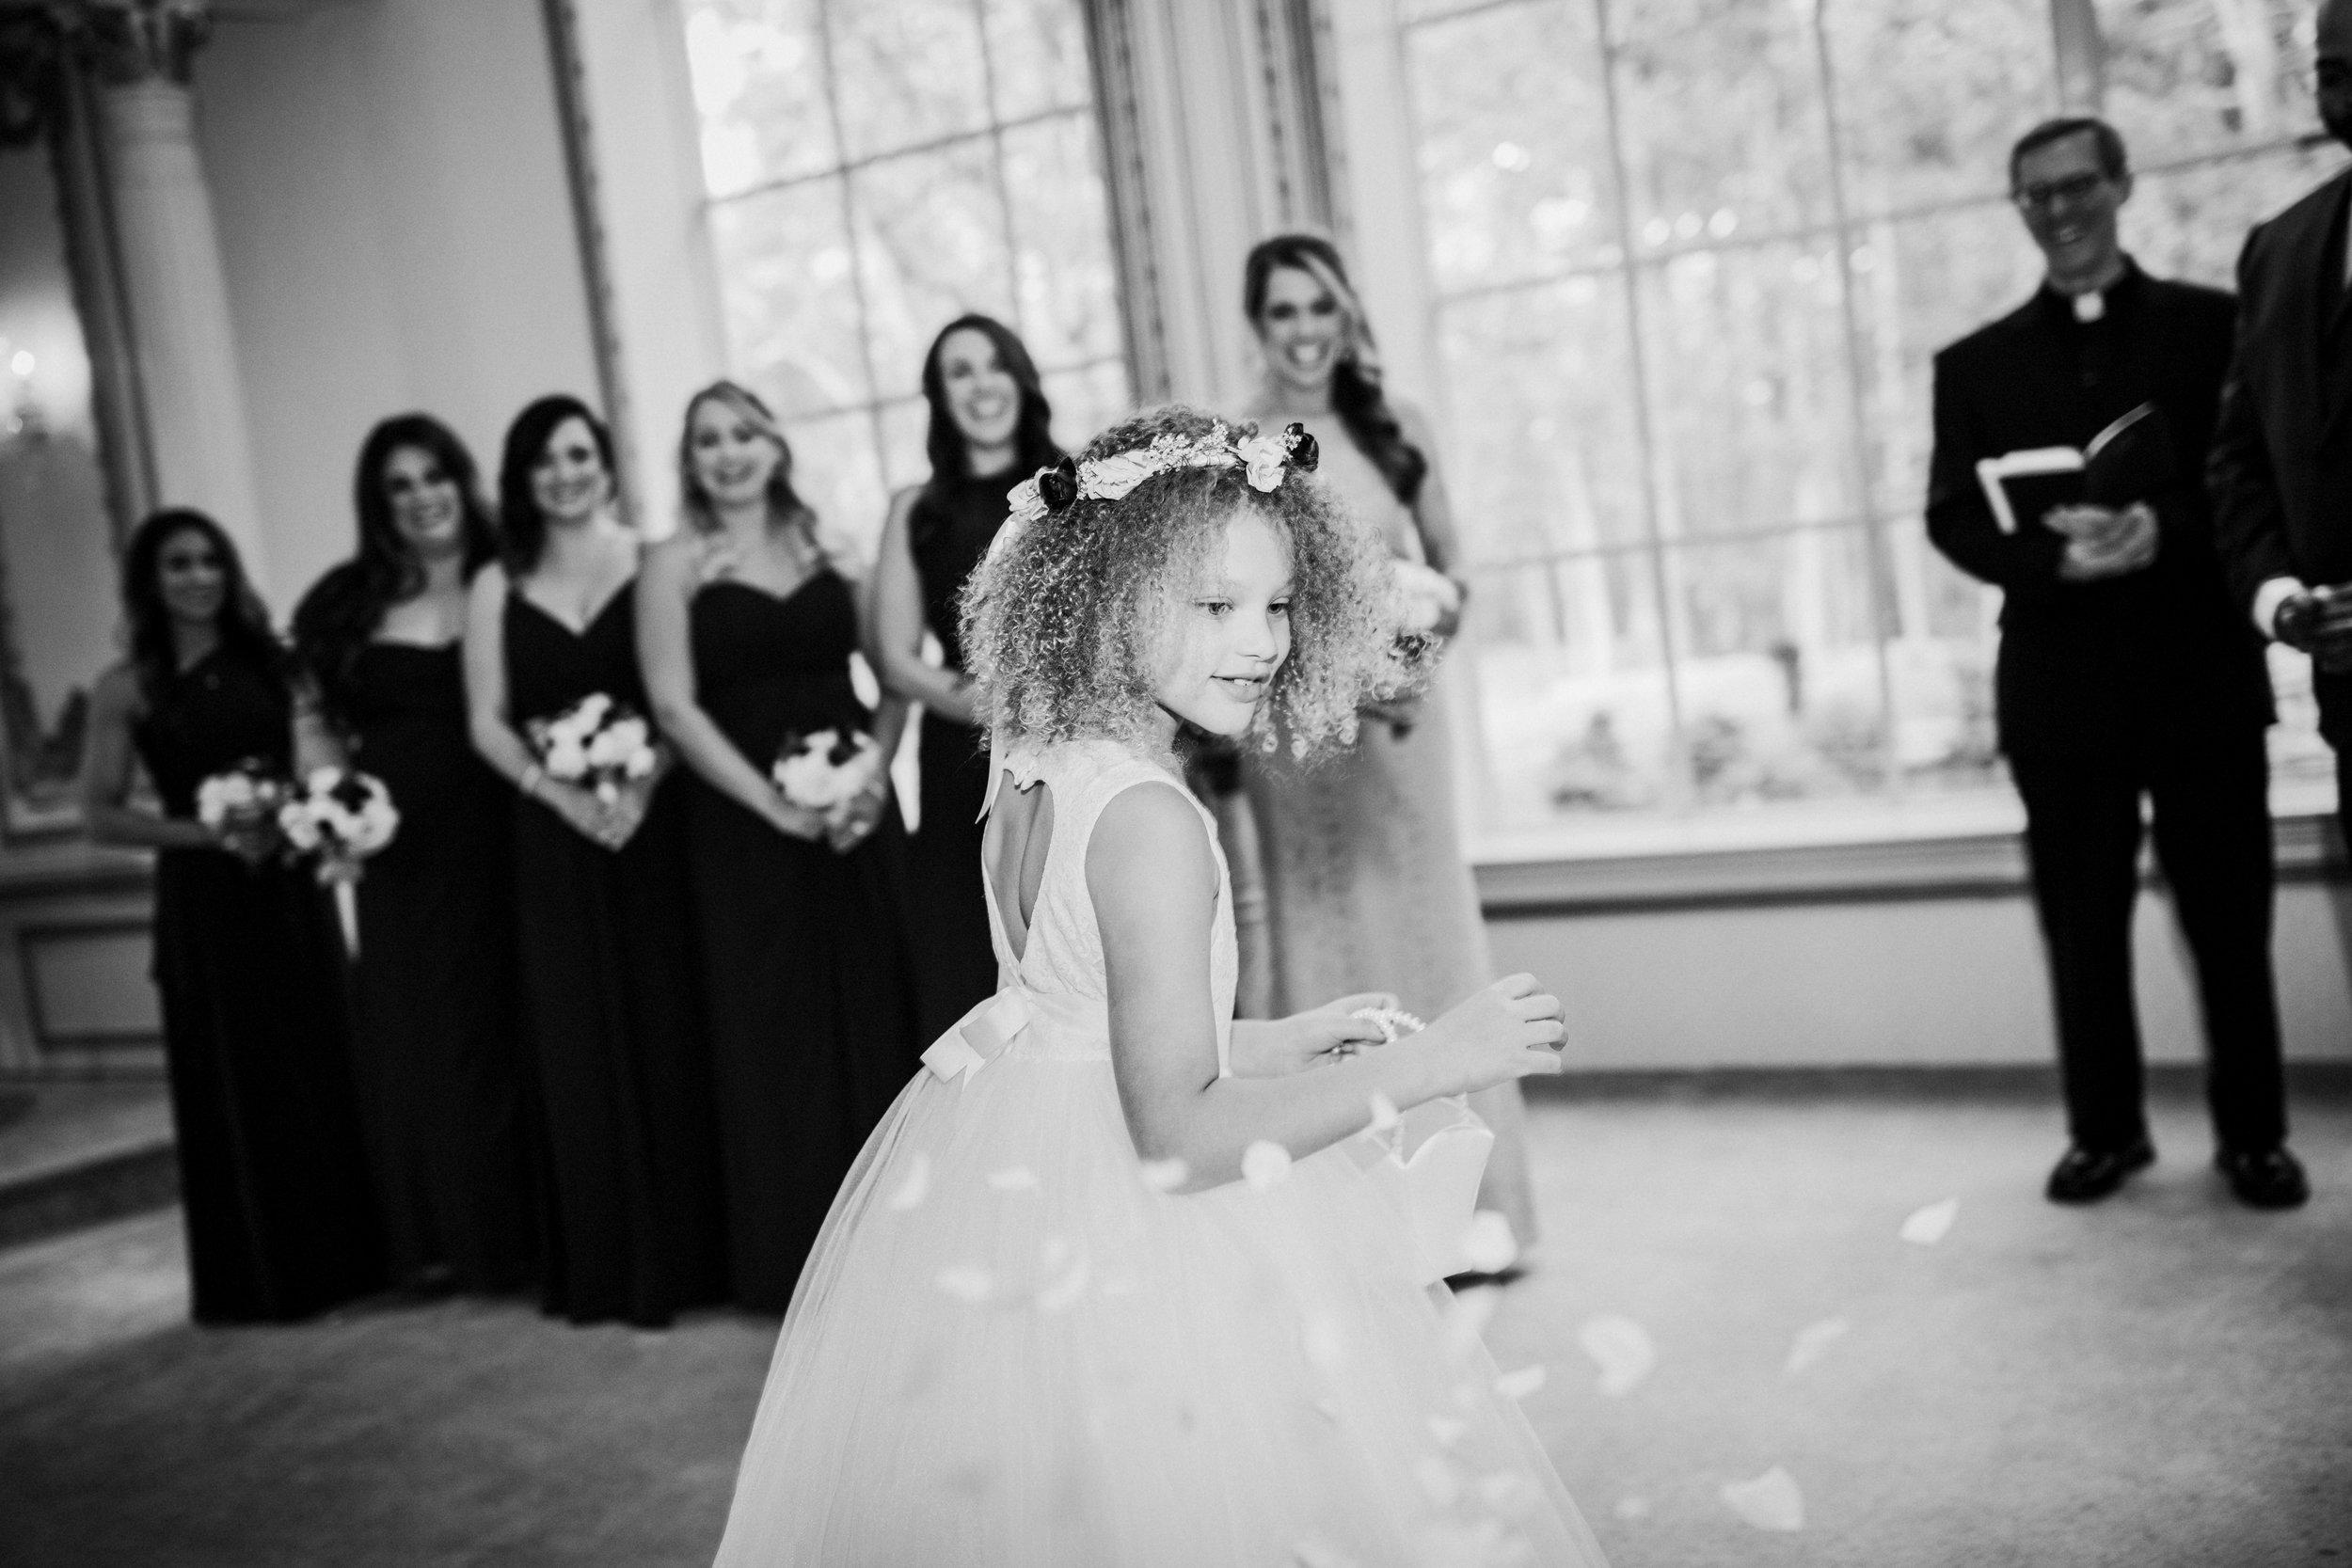 New-Jersey-Wedding-Photography-Brigalias-Deanna&Darryl-CEREMONY-BW-26.jpg